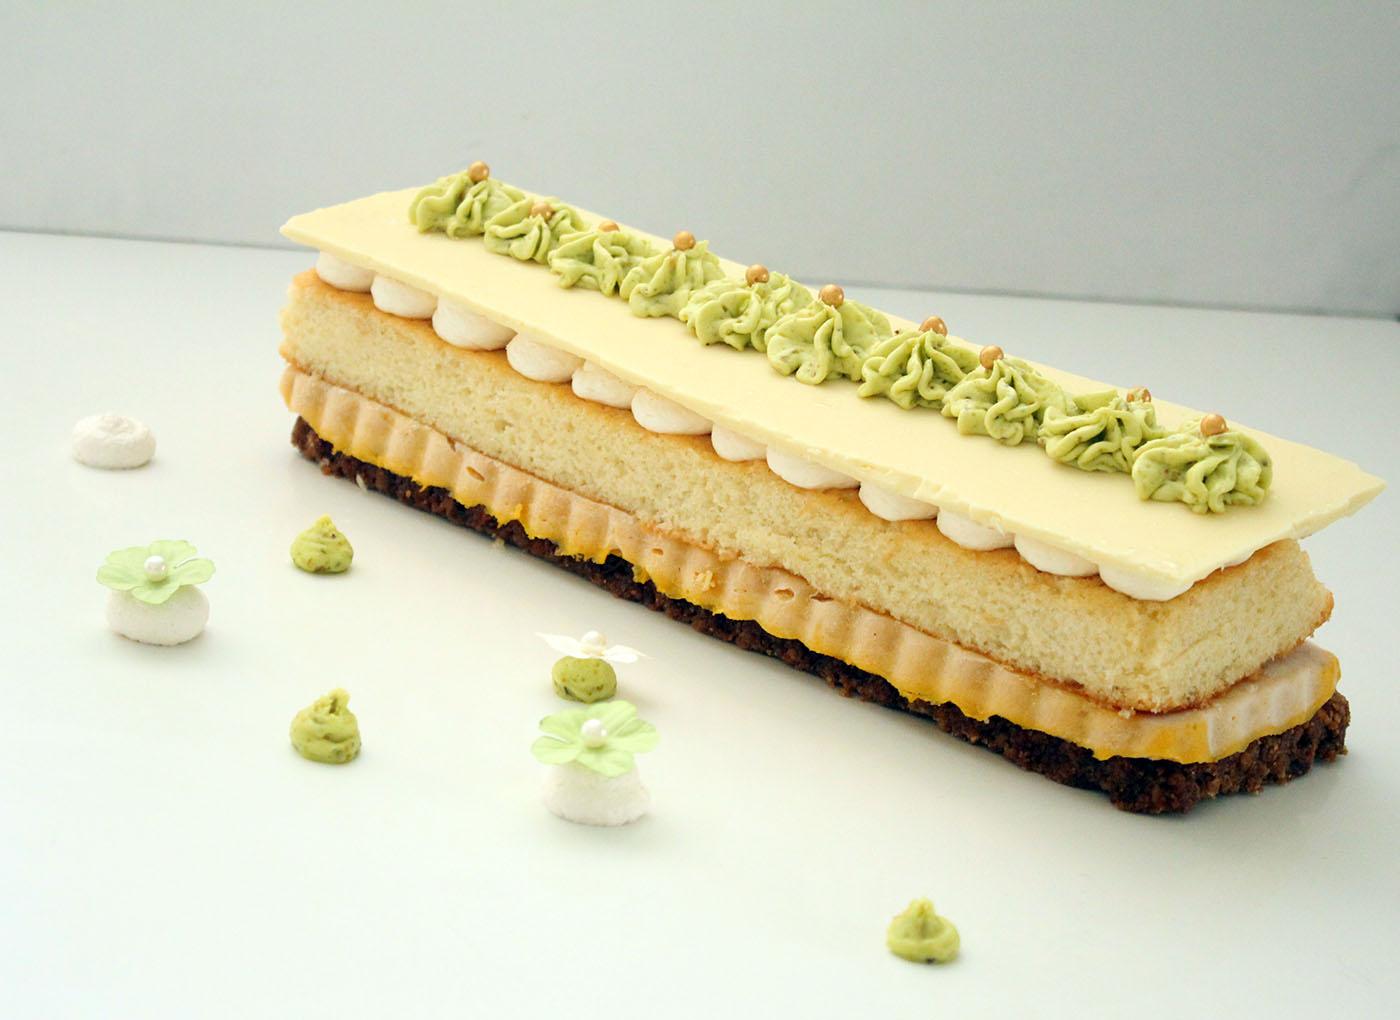 IMG 9254 - עוגת שכבות אקזותית